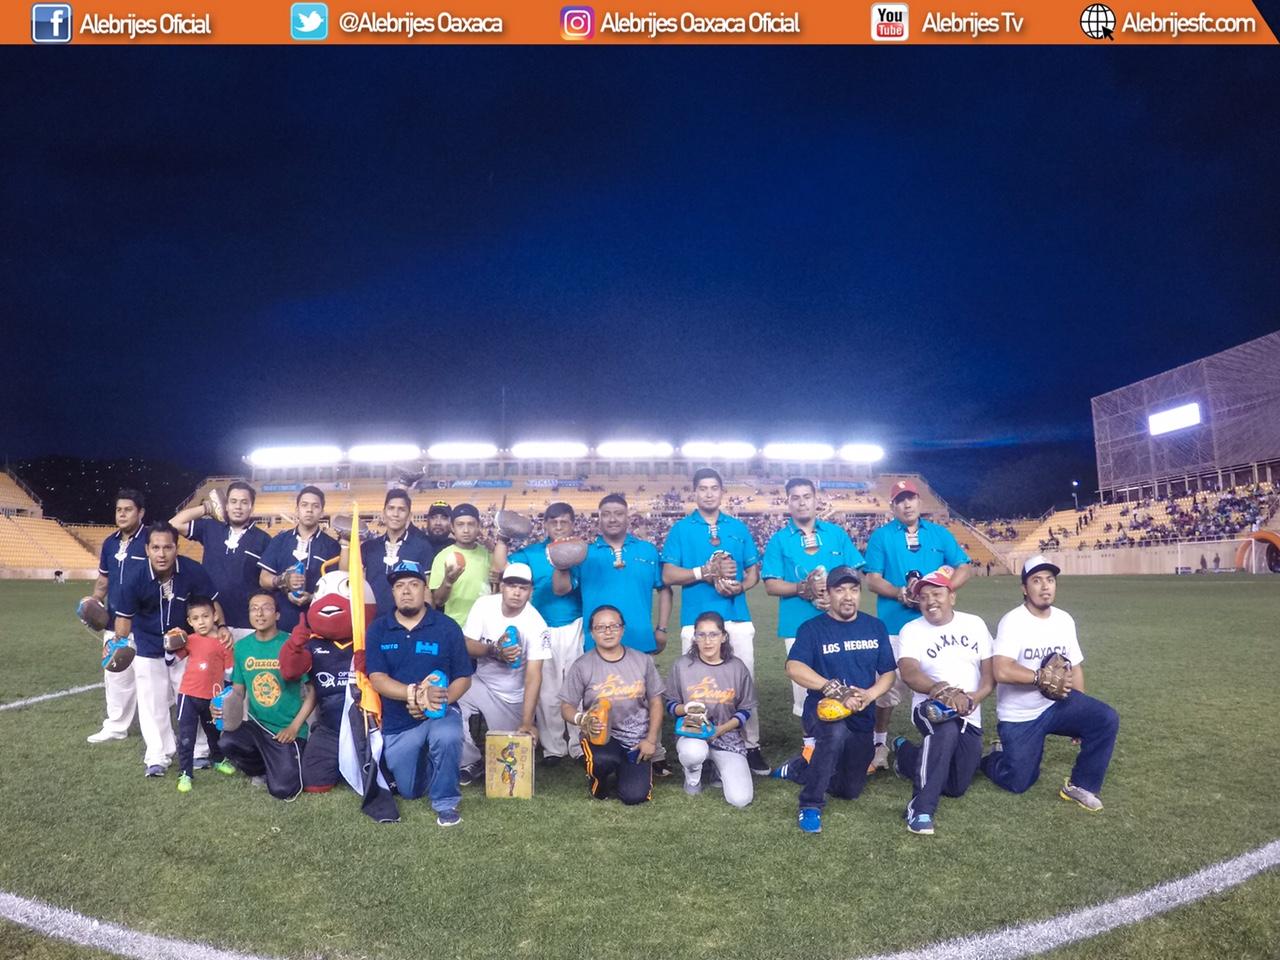 Alebrijes de Oaxaca, pelota mixteca, deporte autóctono, estadio Tecnológico de Oaxaca, Copa MX, León,